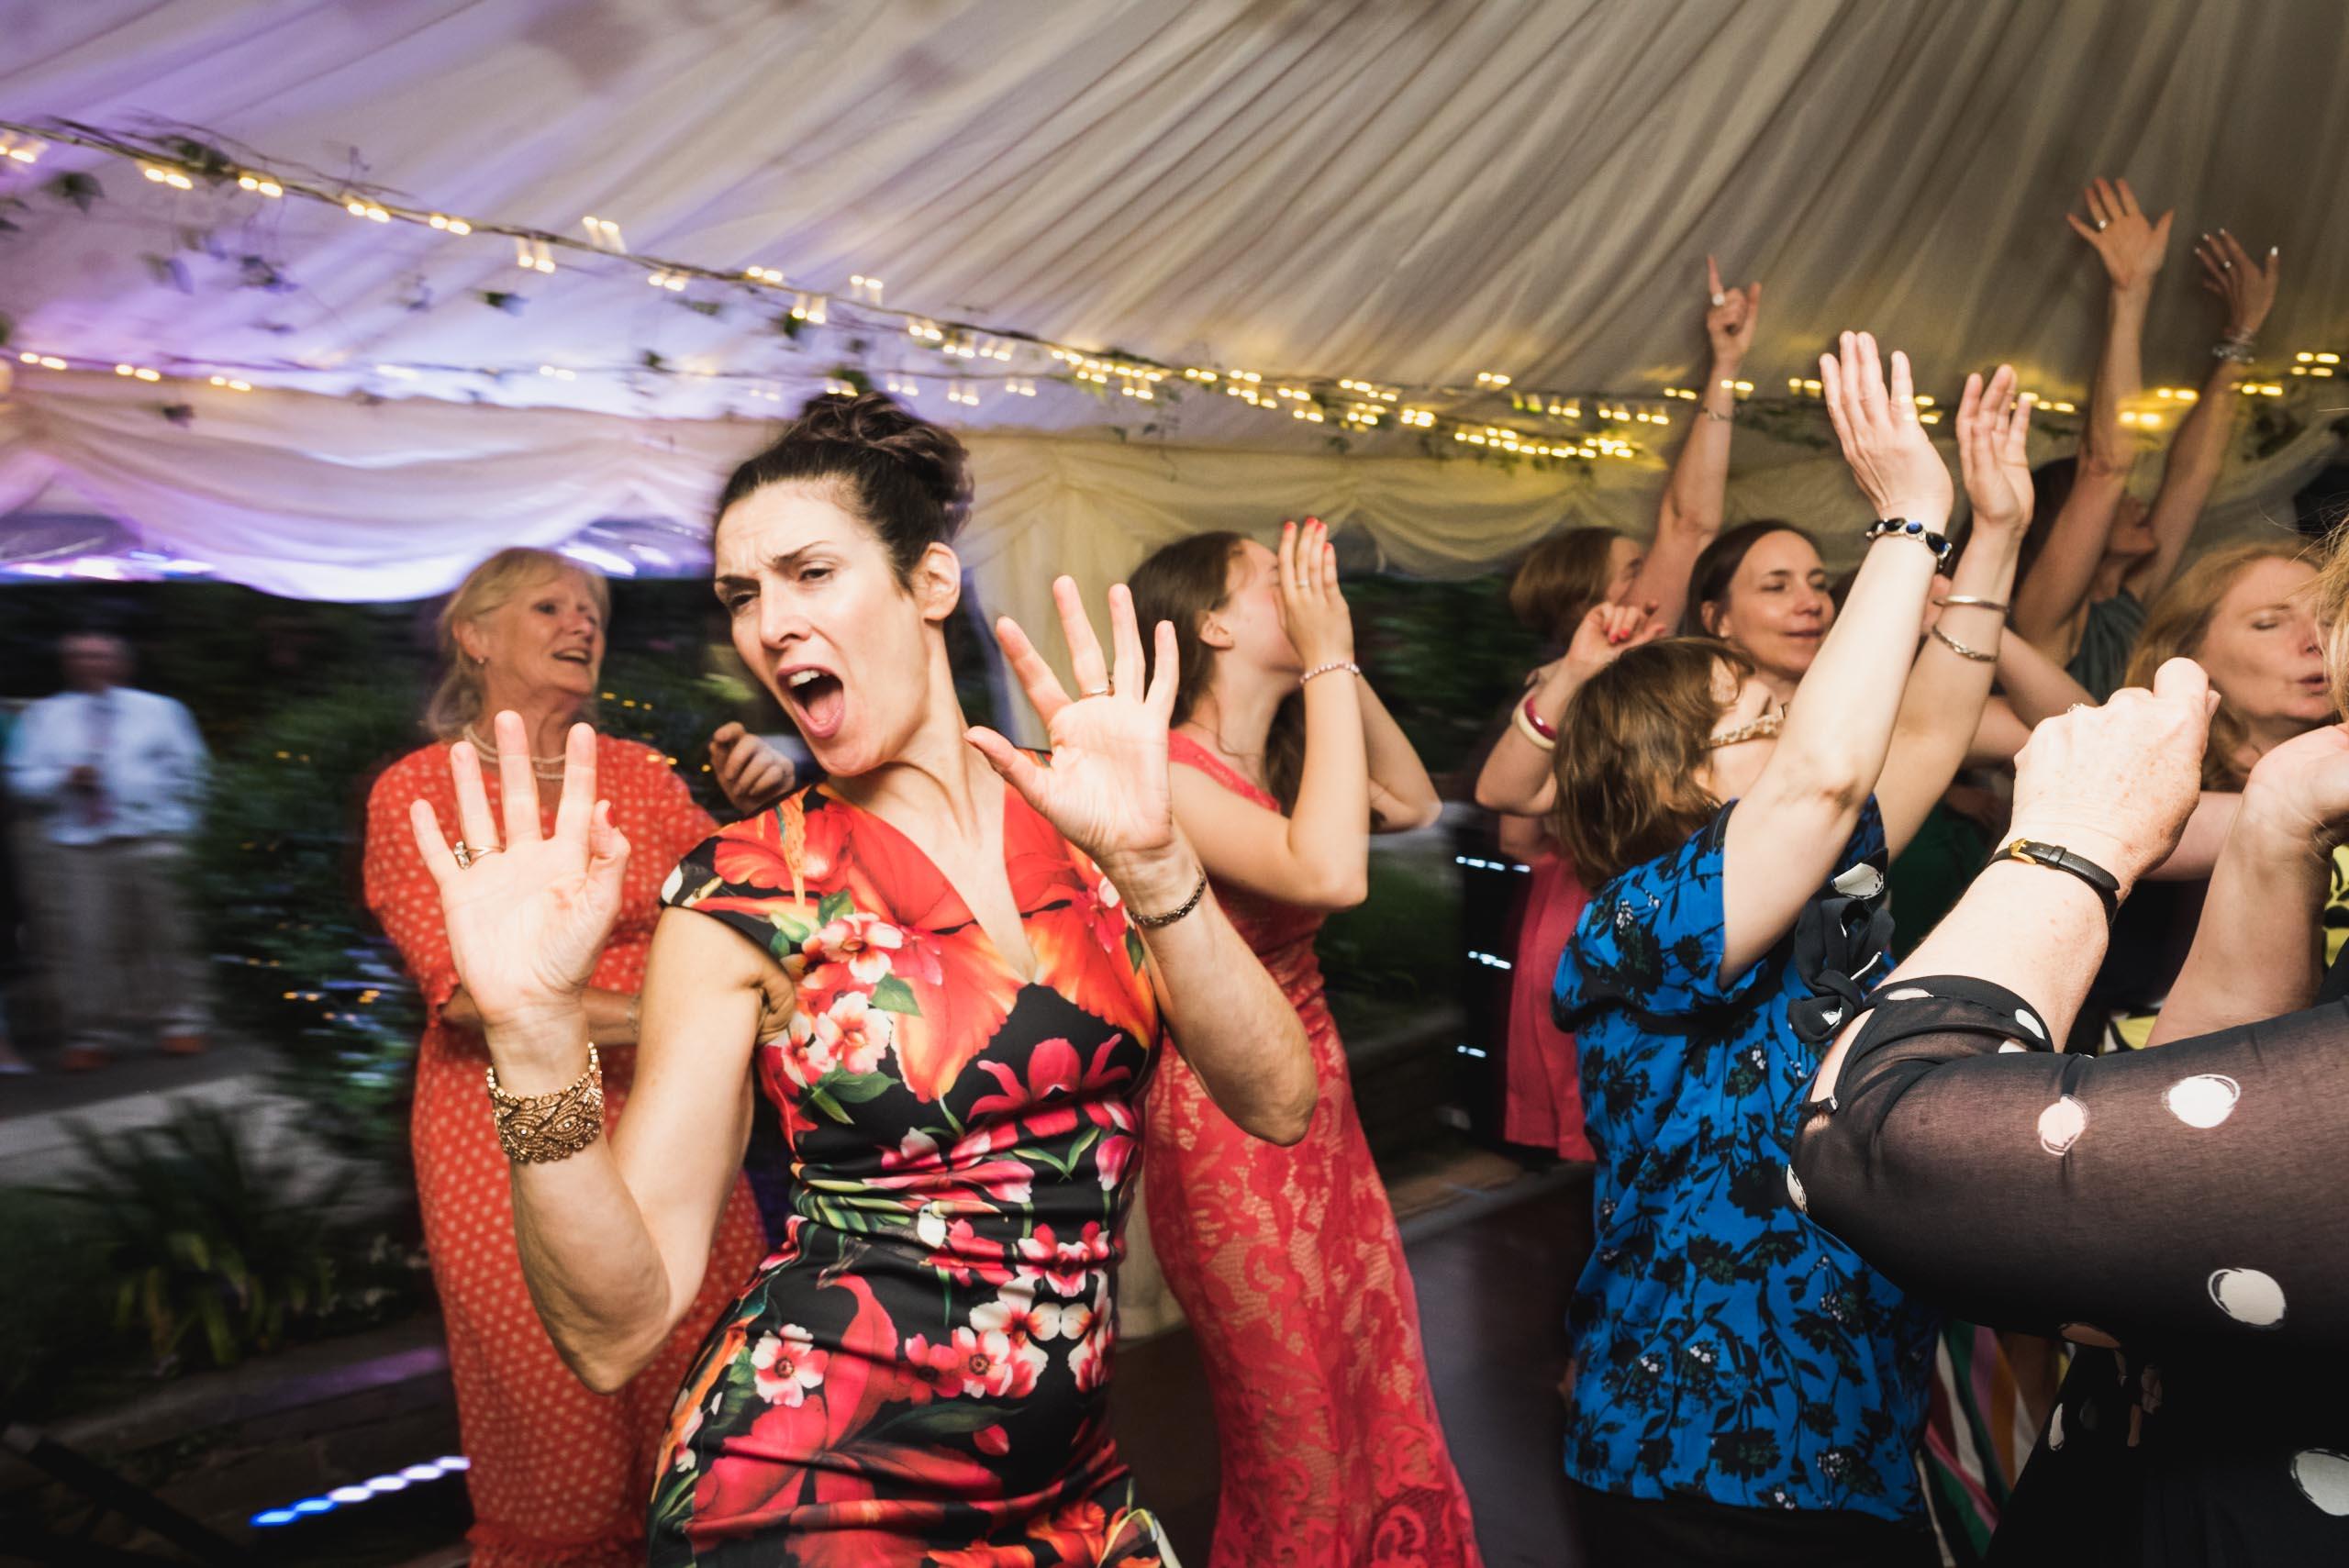 carine bea photography, guests having fun at back garden wedding